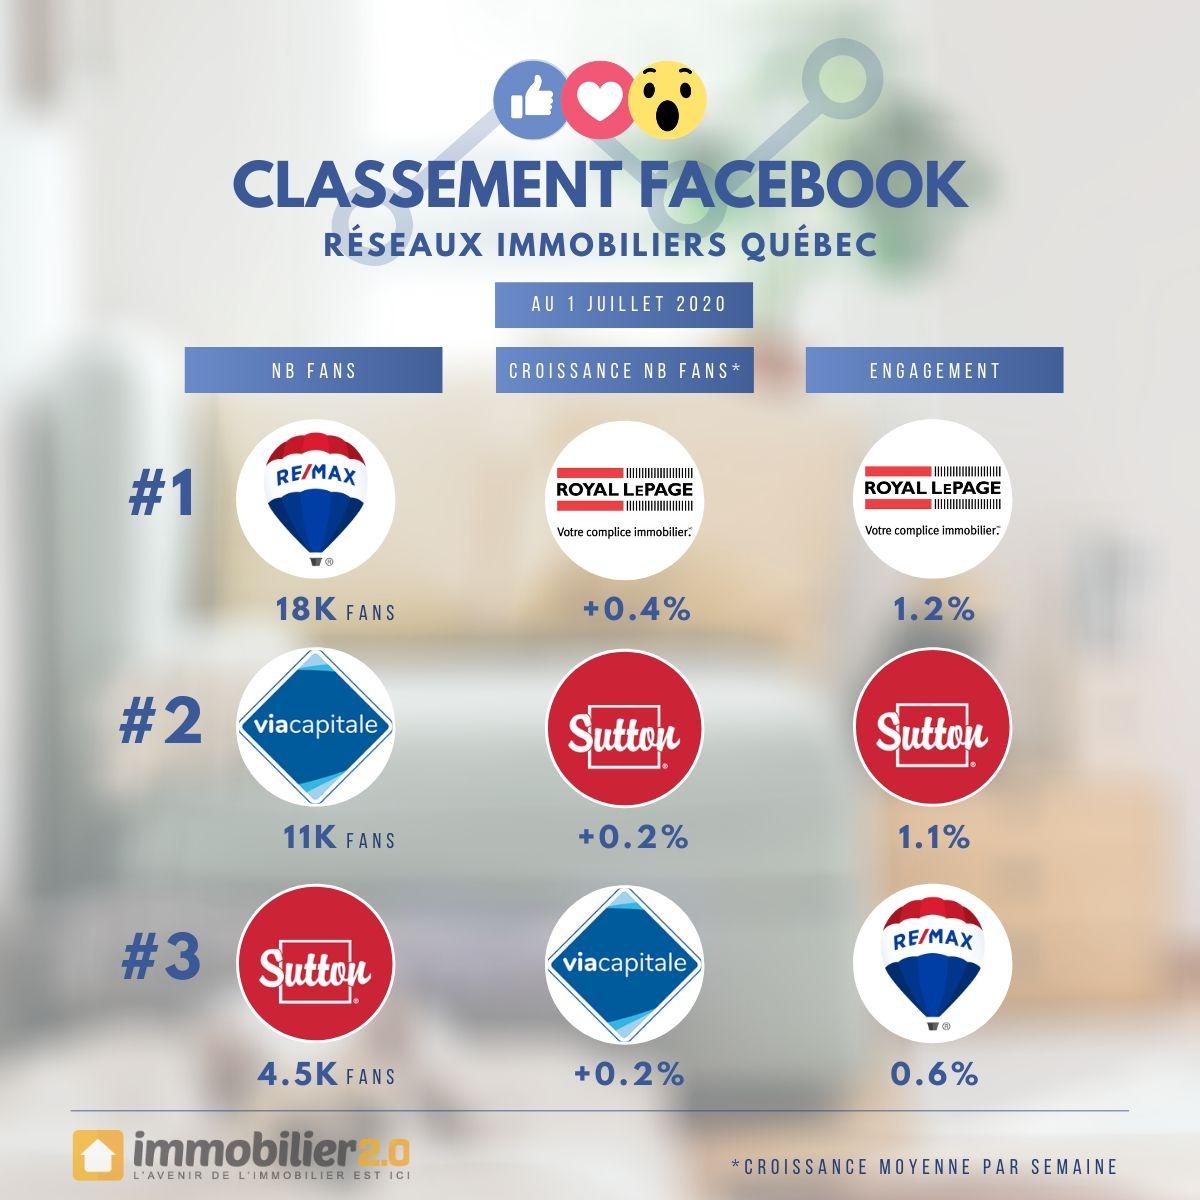 Classement Facebook Marques Immobiliers Quebec Juillet 2020